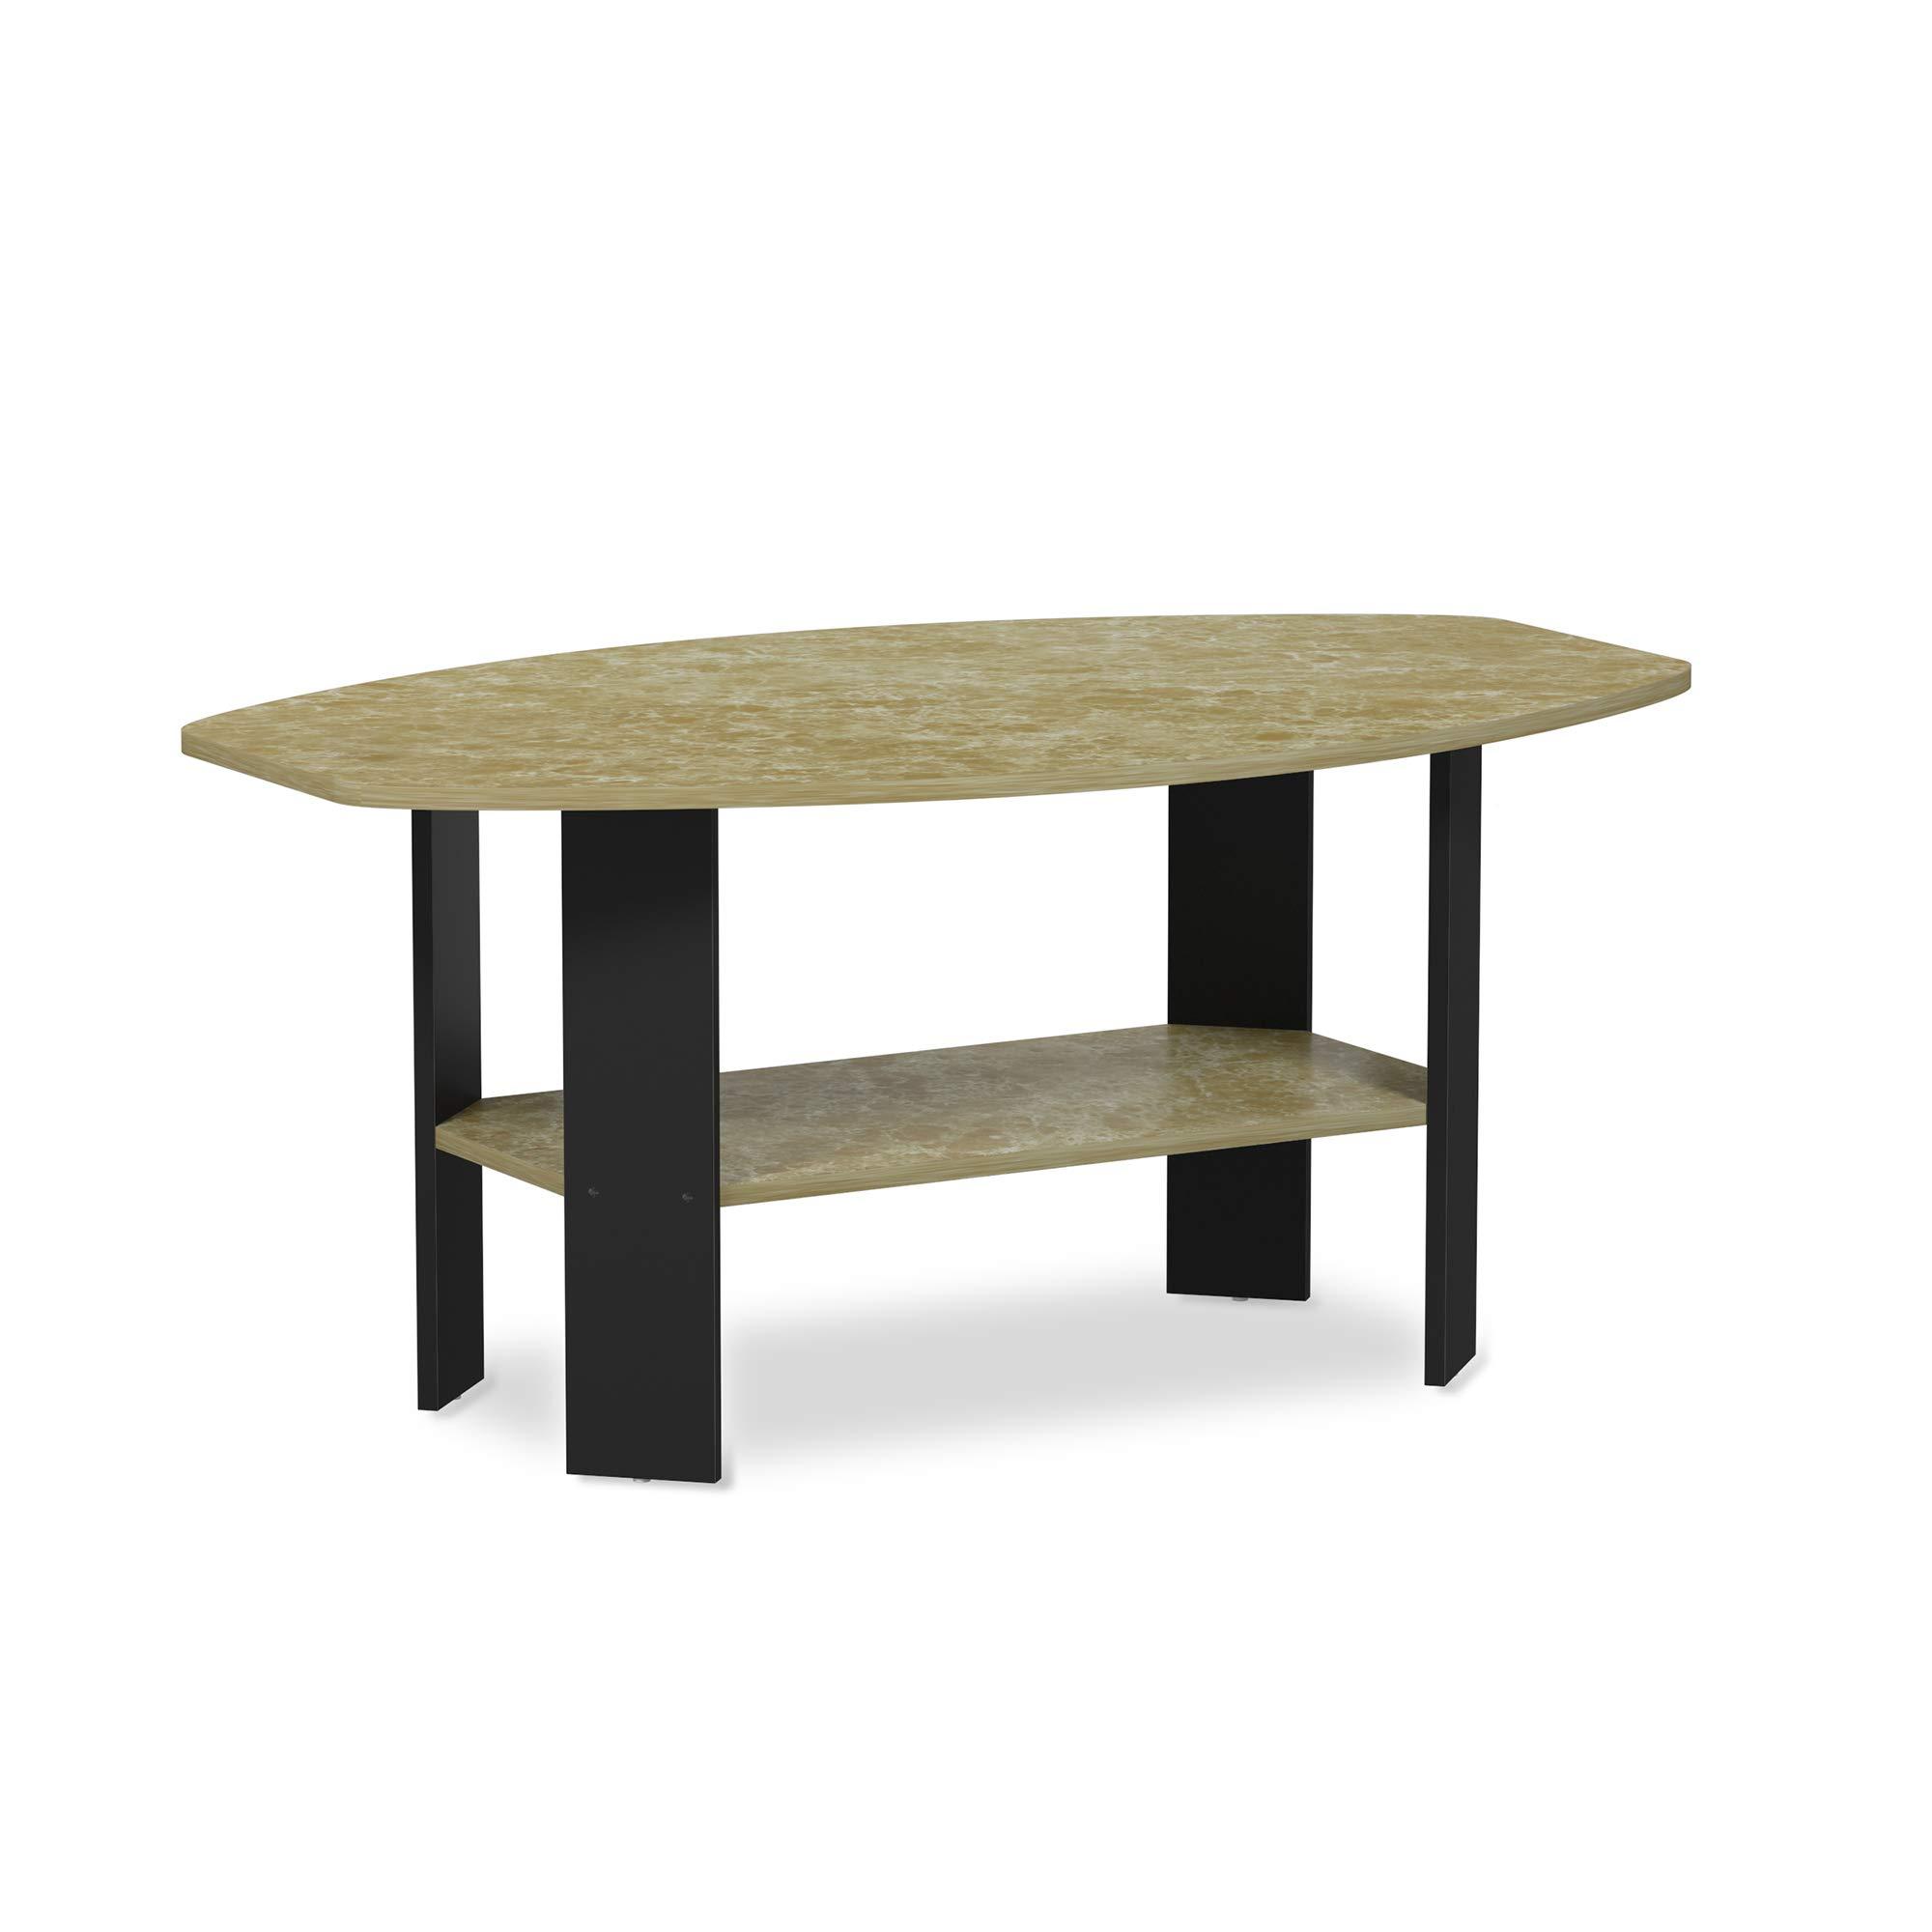 FURINNO 11179BRM Simple Design Coffee Table, Brown Faux Marble/Black by Furinno